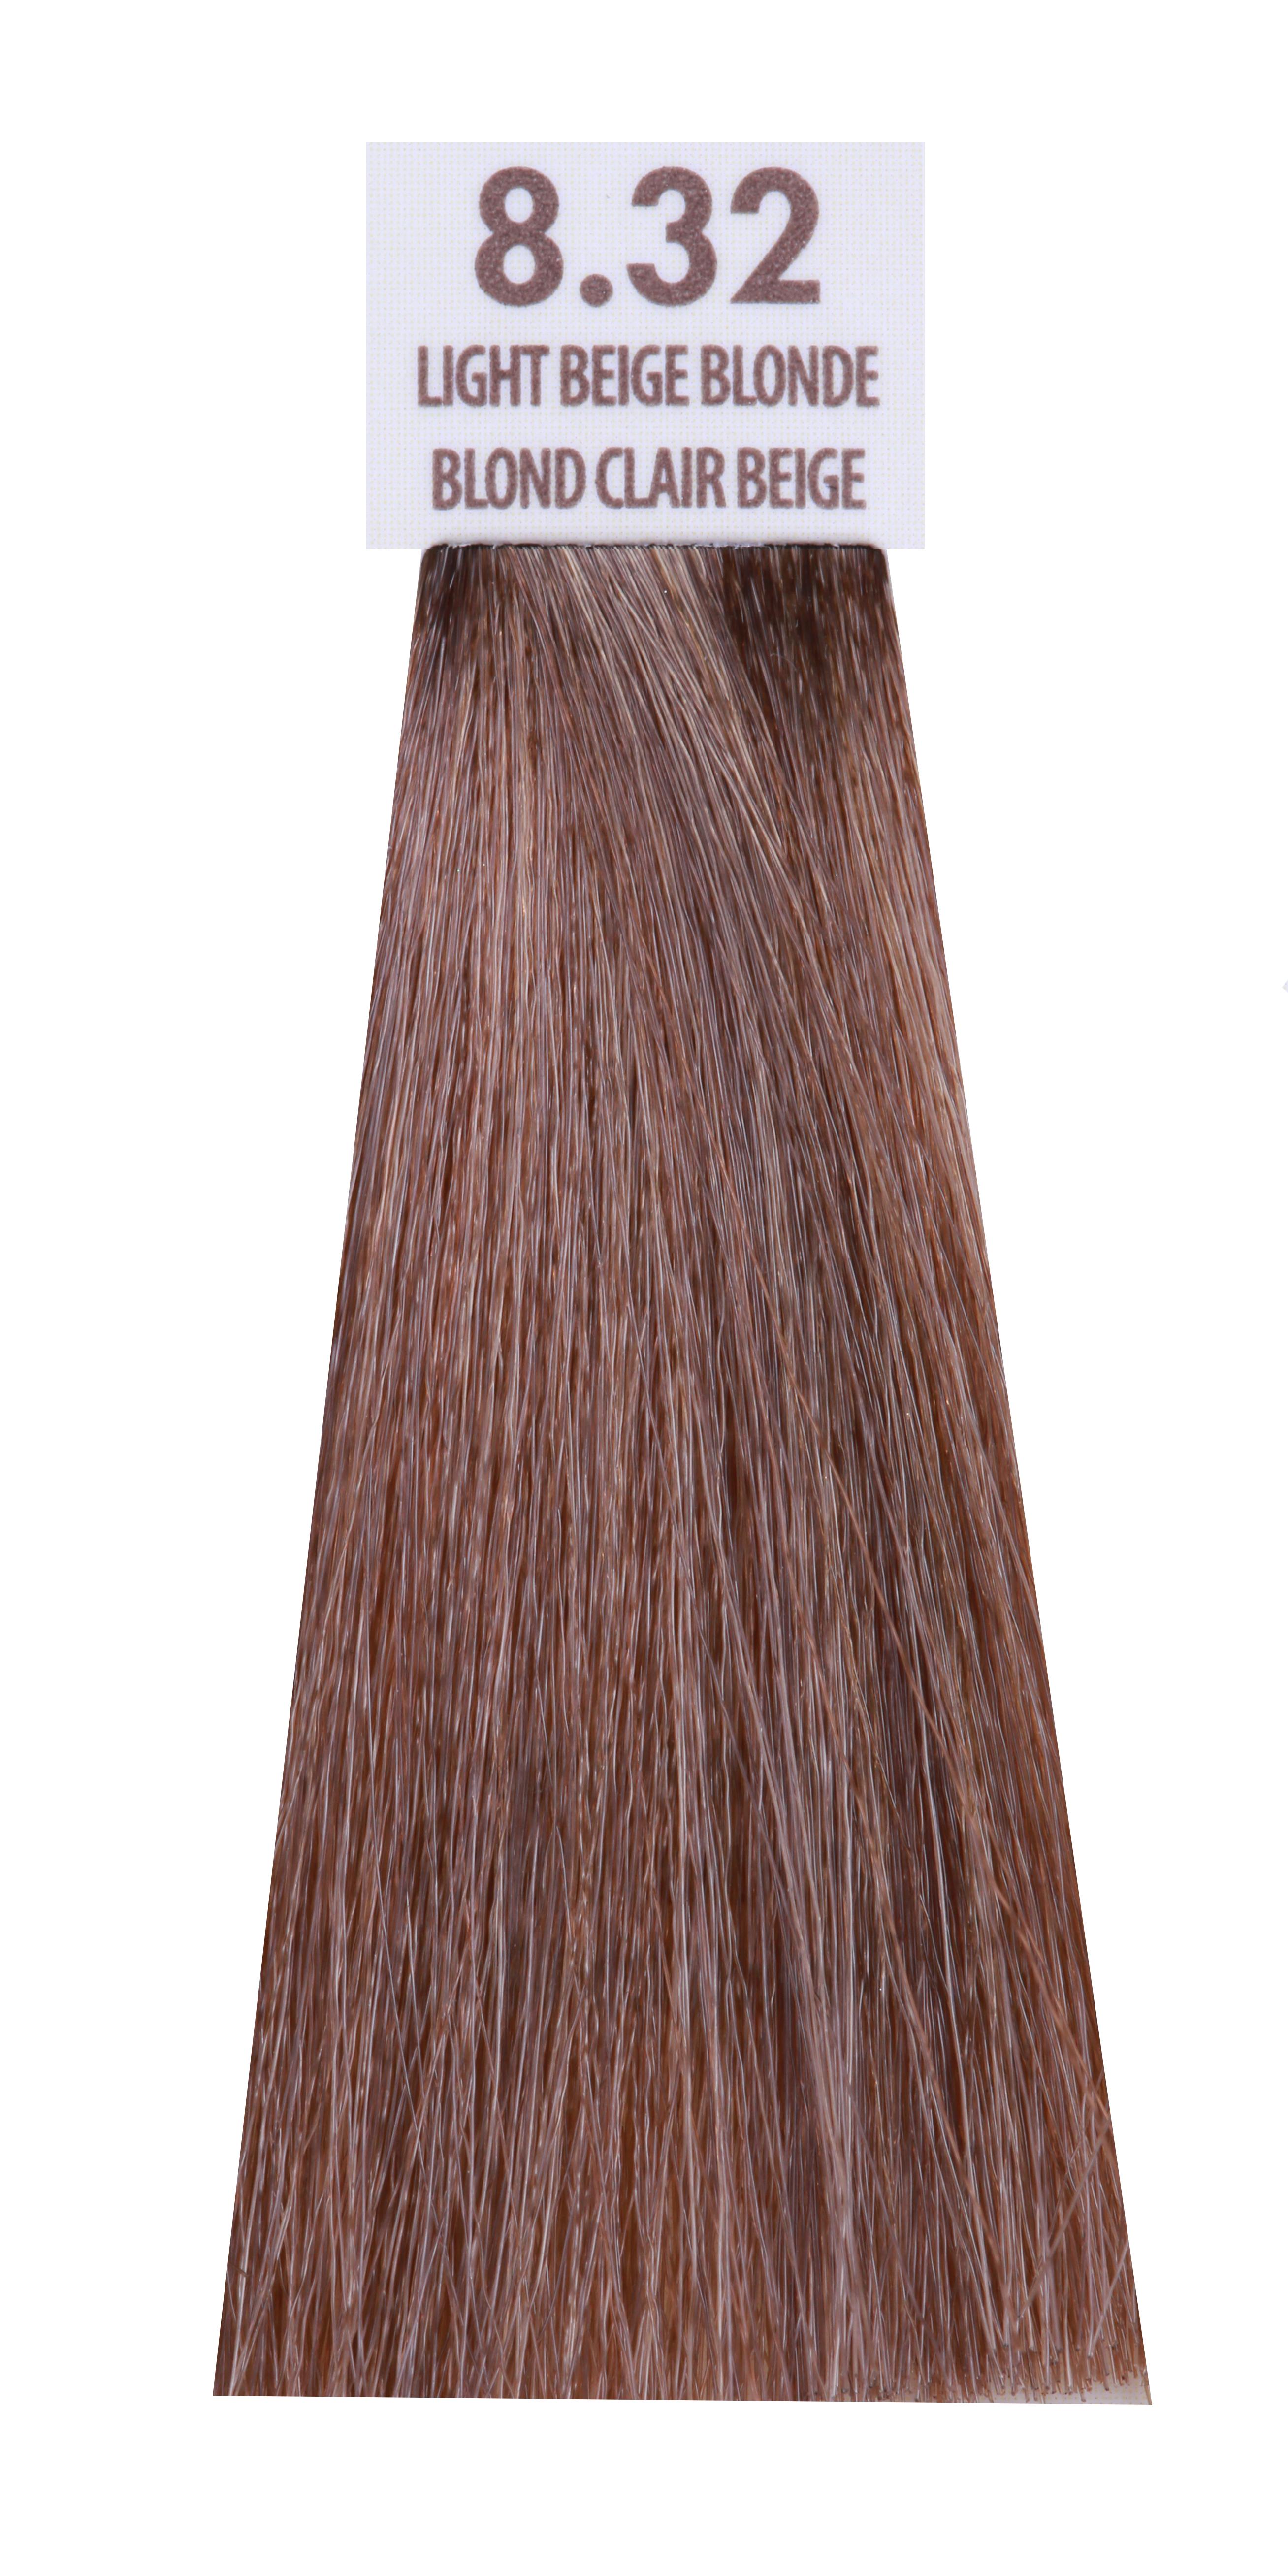 MACADAMIA NATURAL OIL 8.32 краска для волос, светлый бежевый блондин / MACADAMIA COLORS 100 мл фото